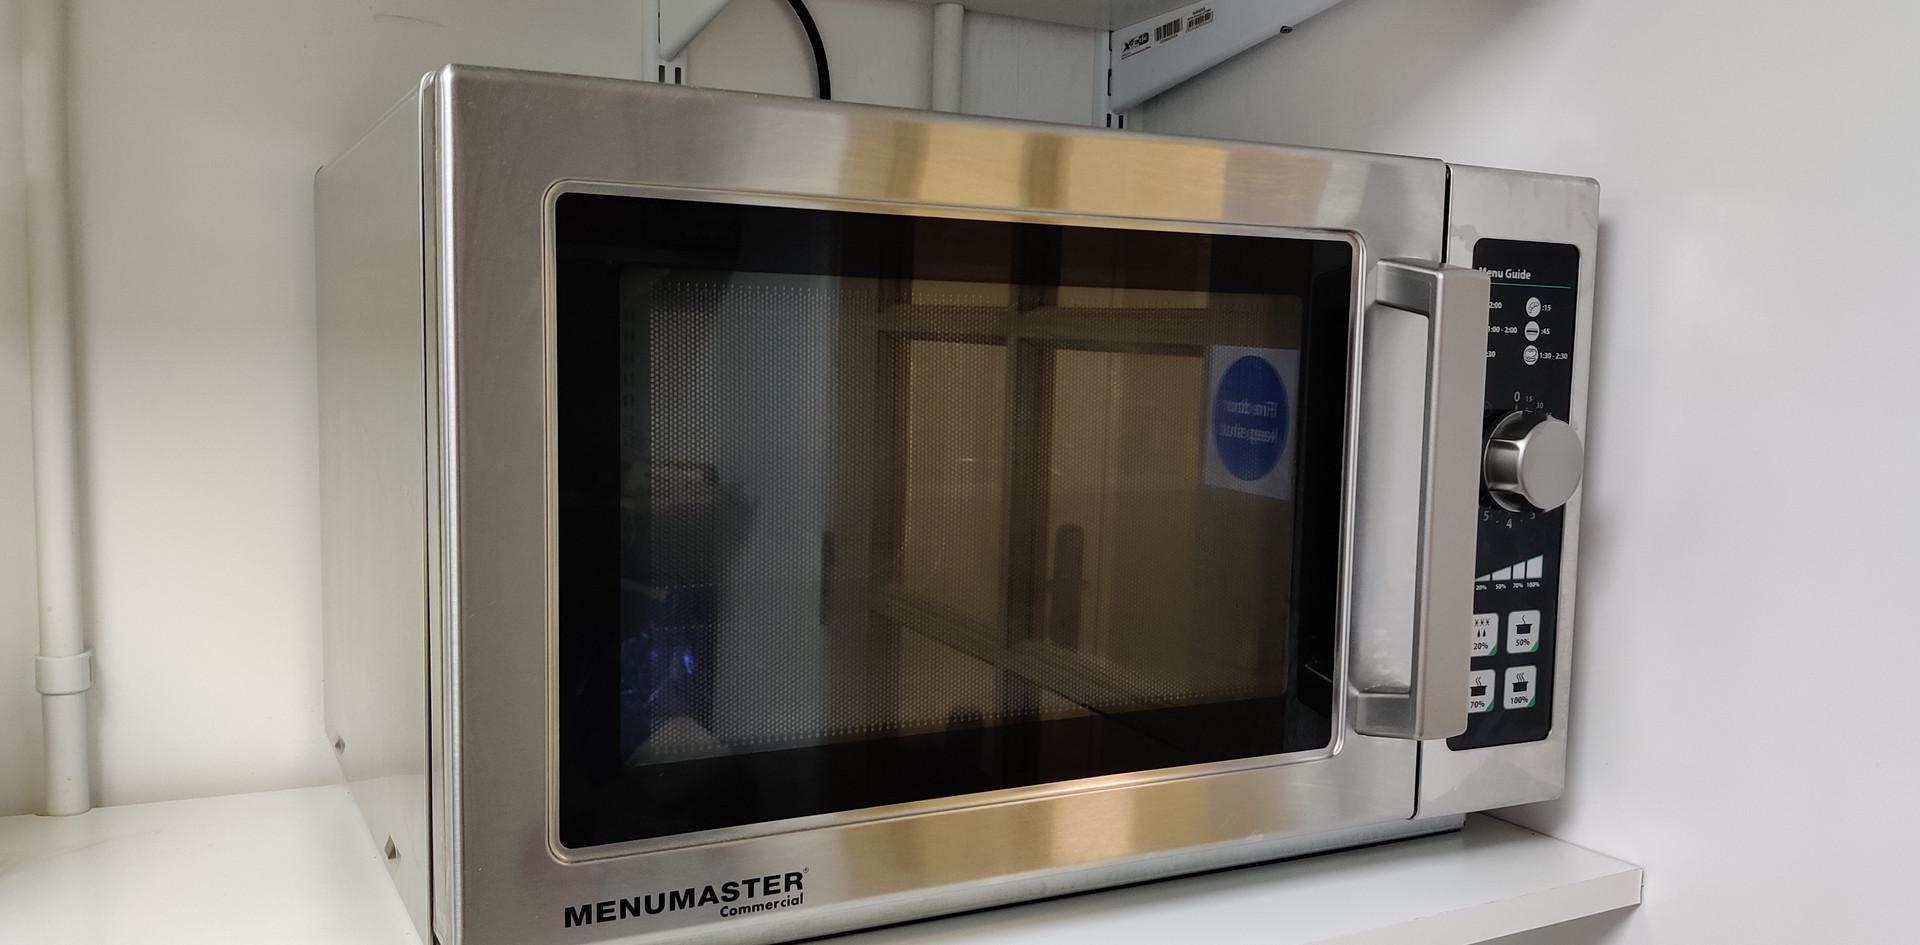 Professional microwave